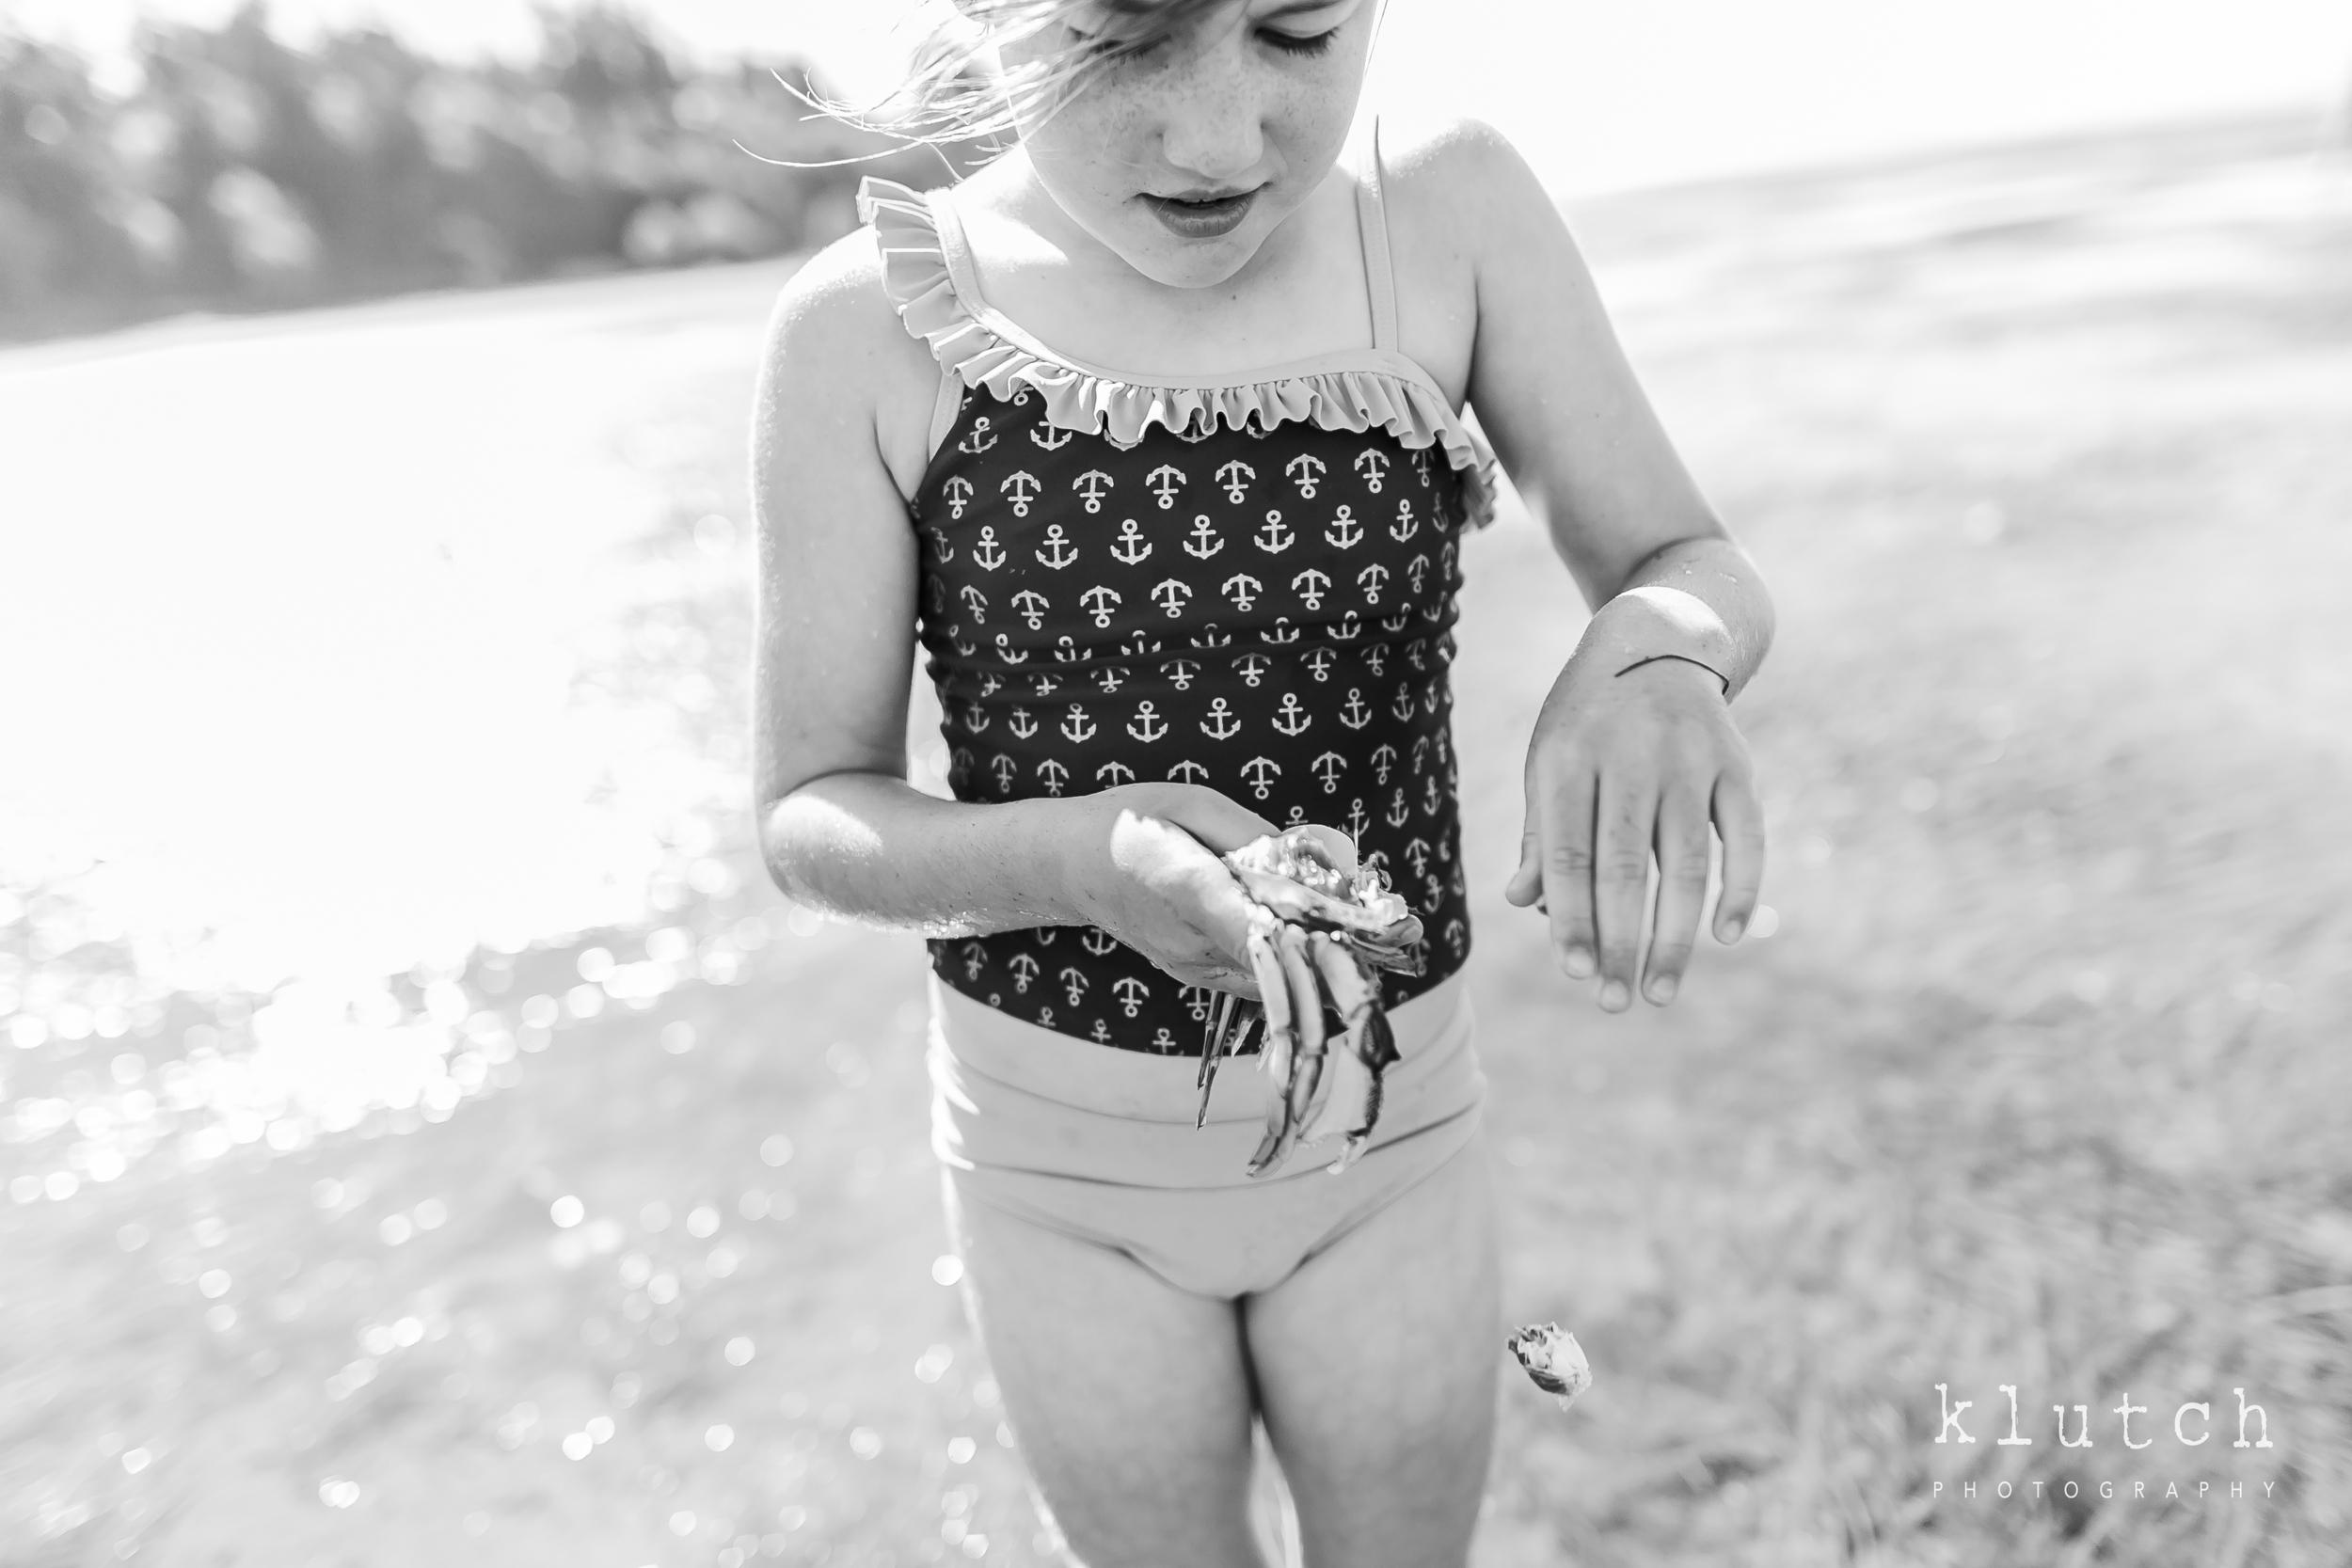 Klutch Photography,white rock family photographer, vancouver family photographer, whiterock lifestyle photographer, life unscripted photographer, life unscripted session, photography,Dina Ferreira Stoddard-5677.jpg